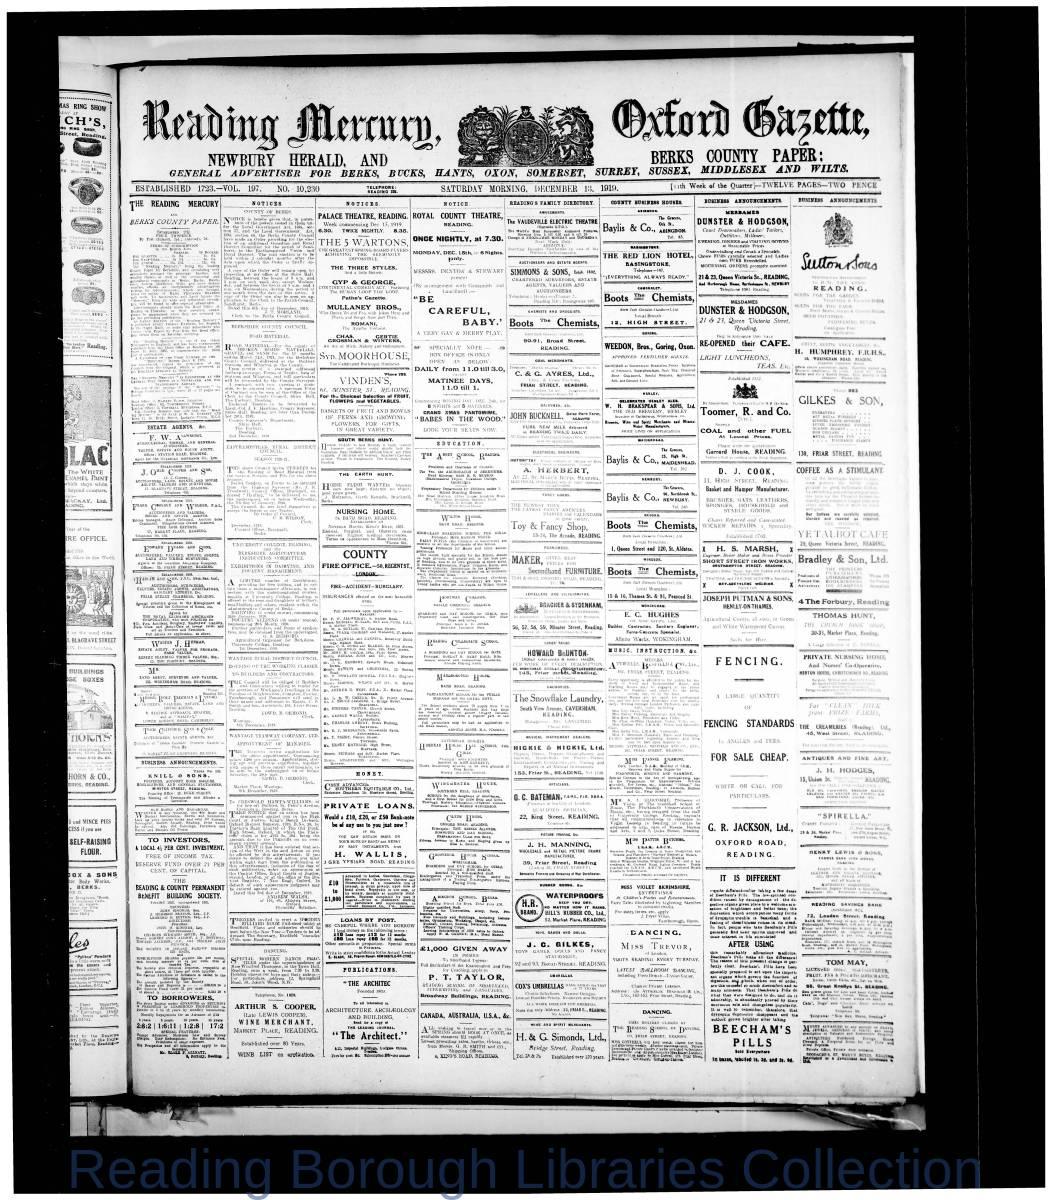 Reading Mercury Oxford Gazette Saturday, December 13, 1919. Pg 1